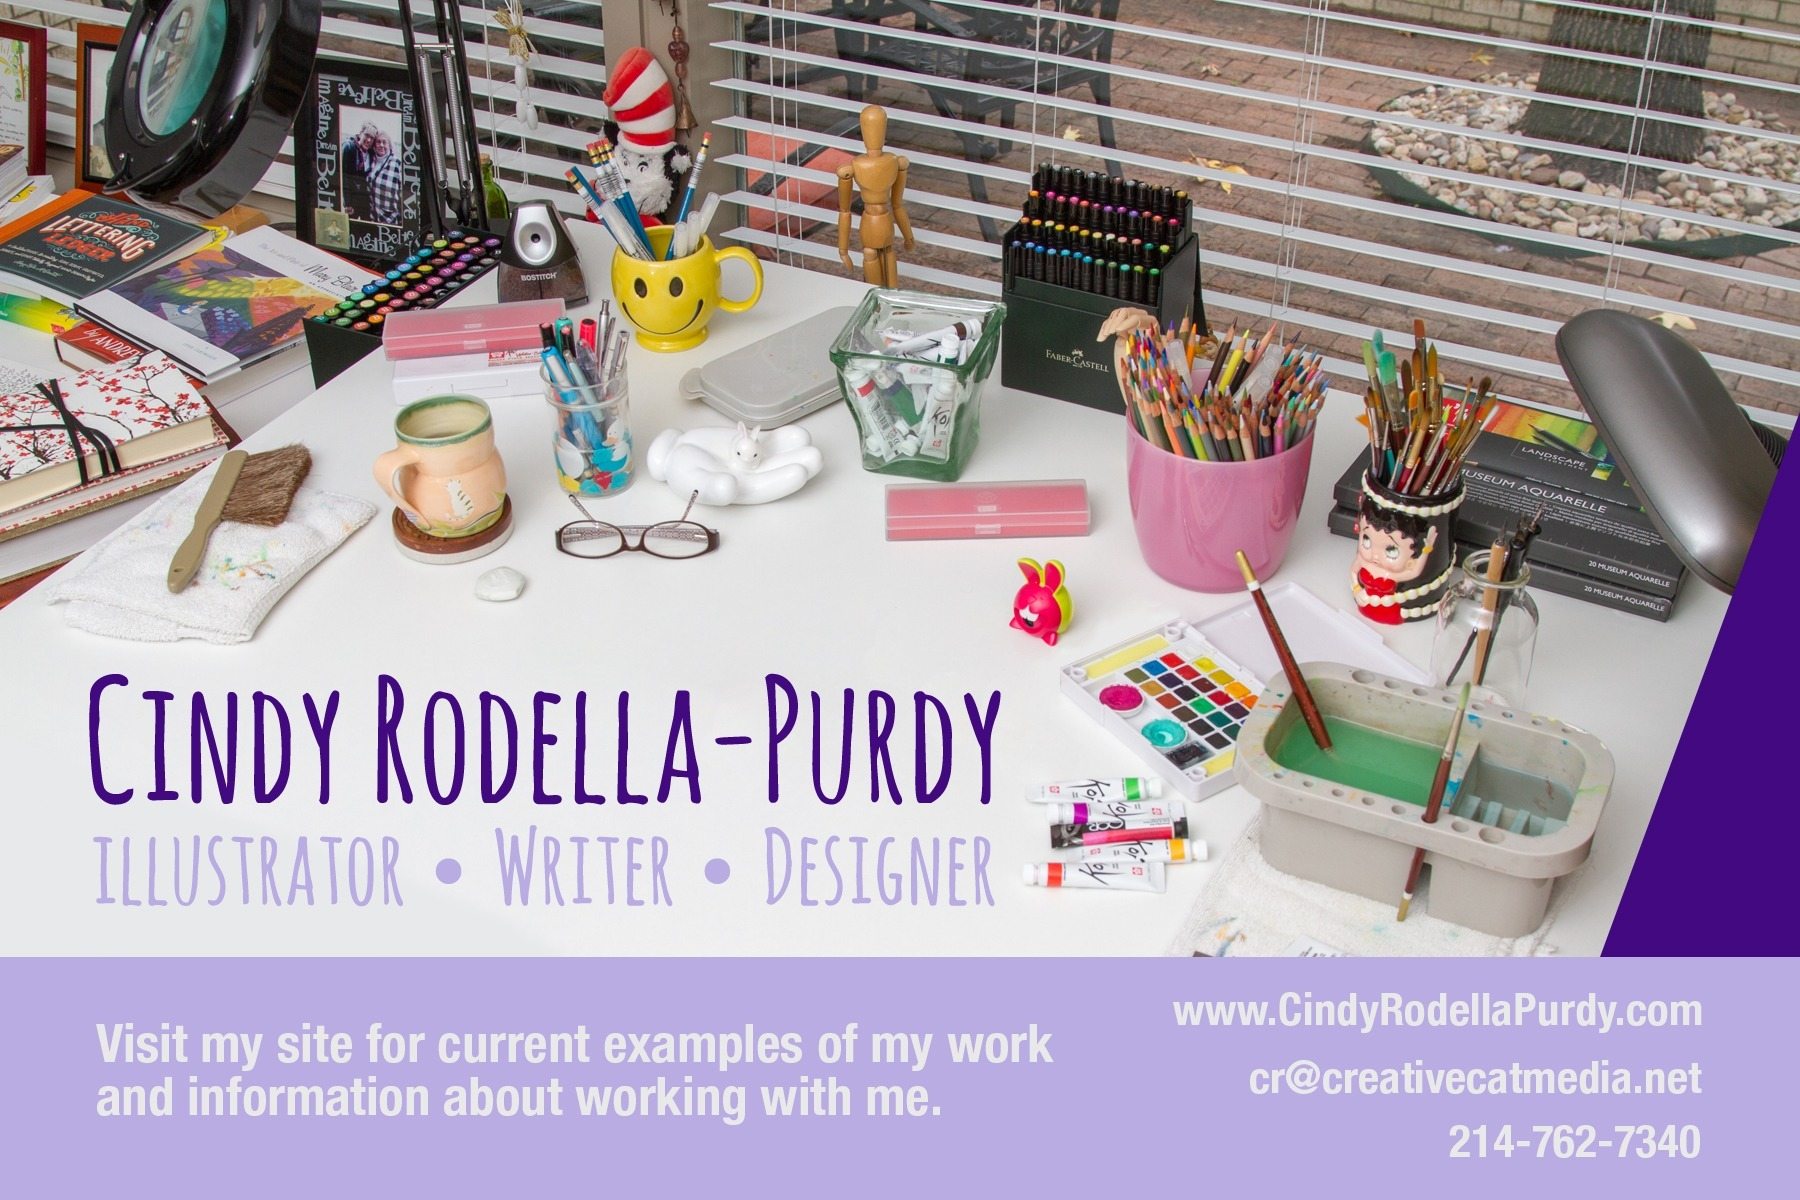 CindyRodellaPurdy-Postcard